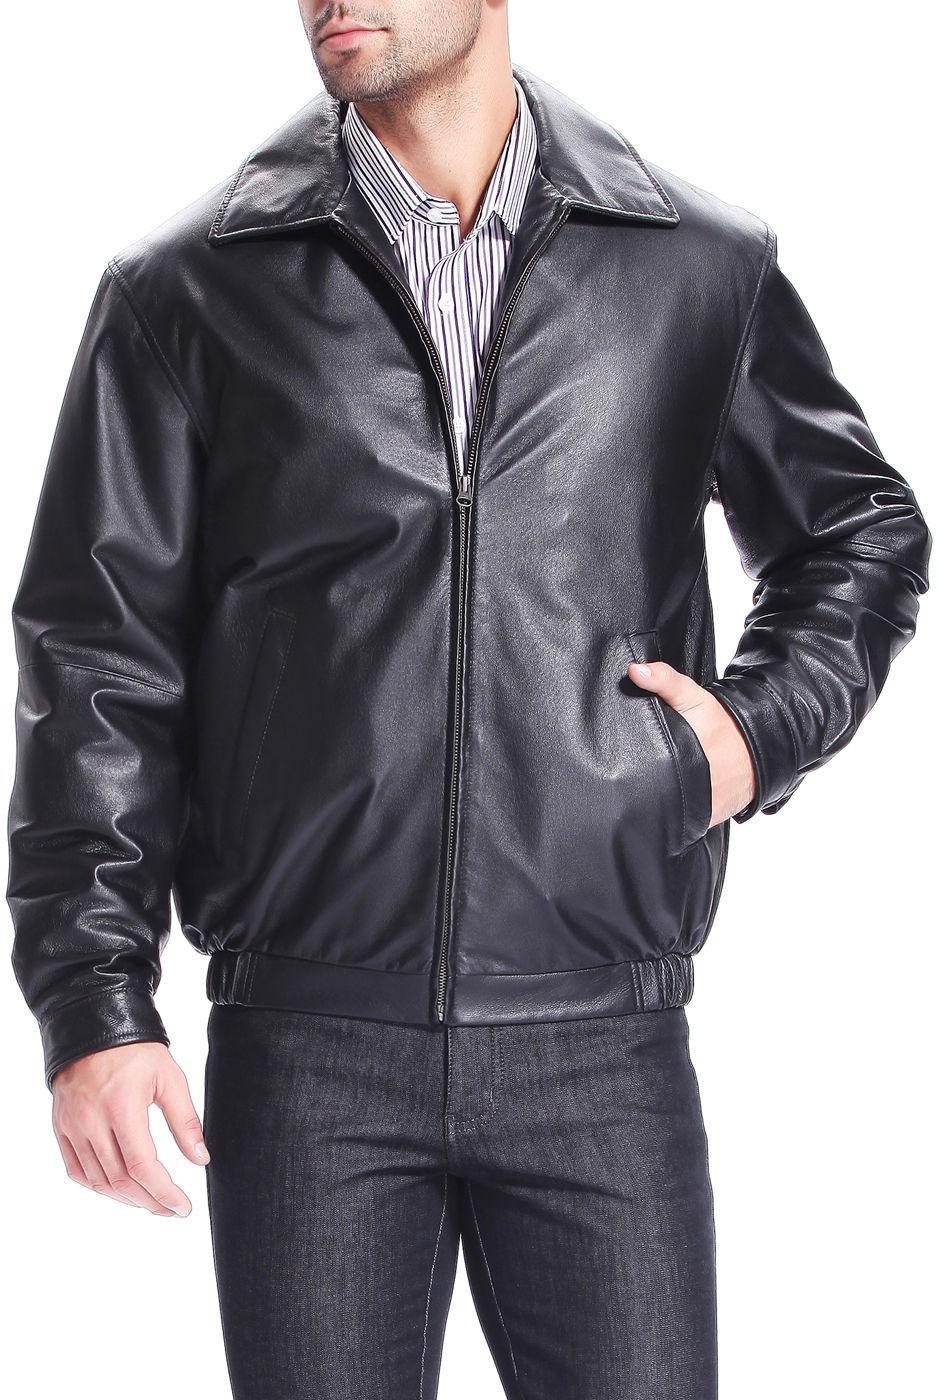 New Men's Stylish Lambskin Genuine Leather Motorcycle Biker Slim Fit Jacket  GN2